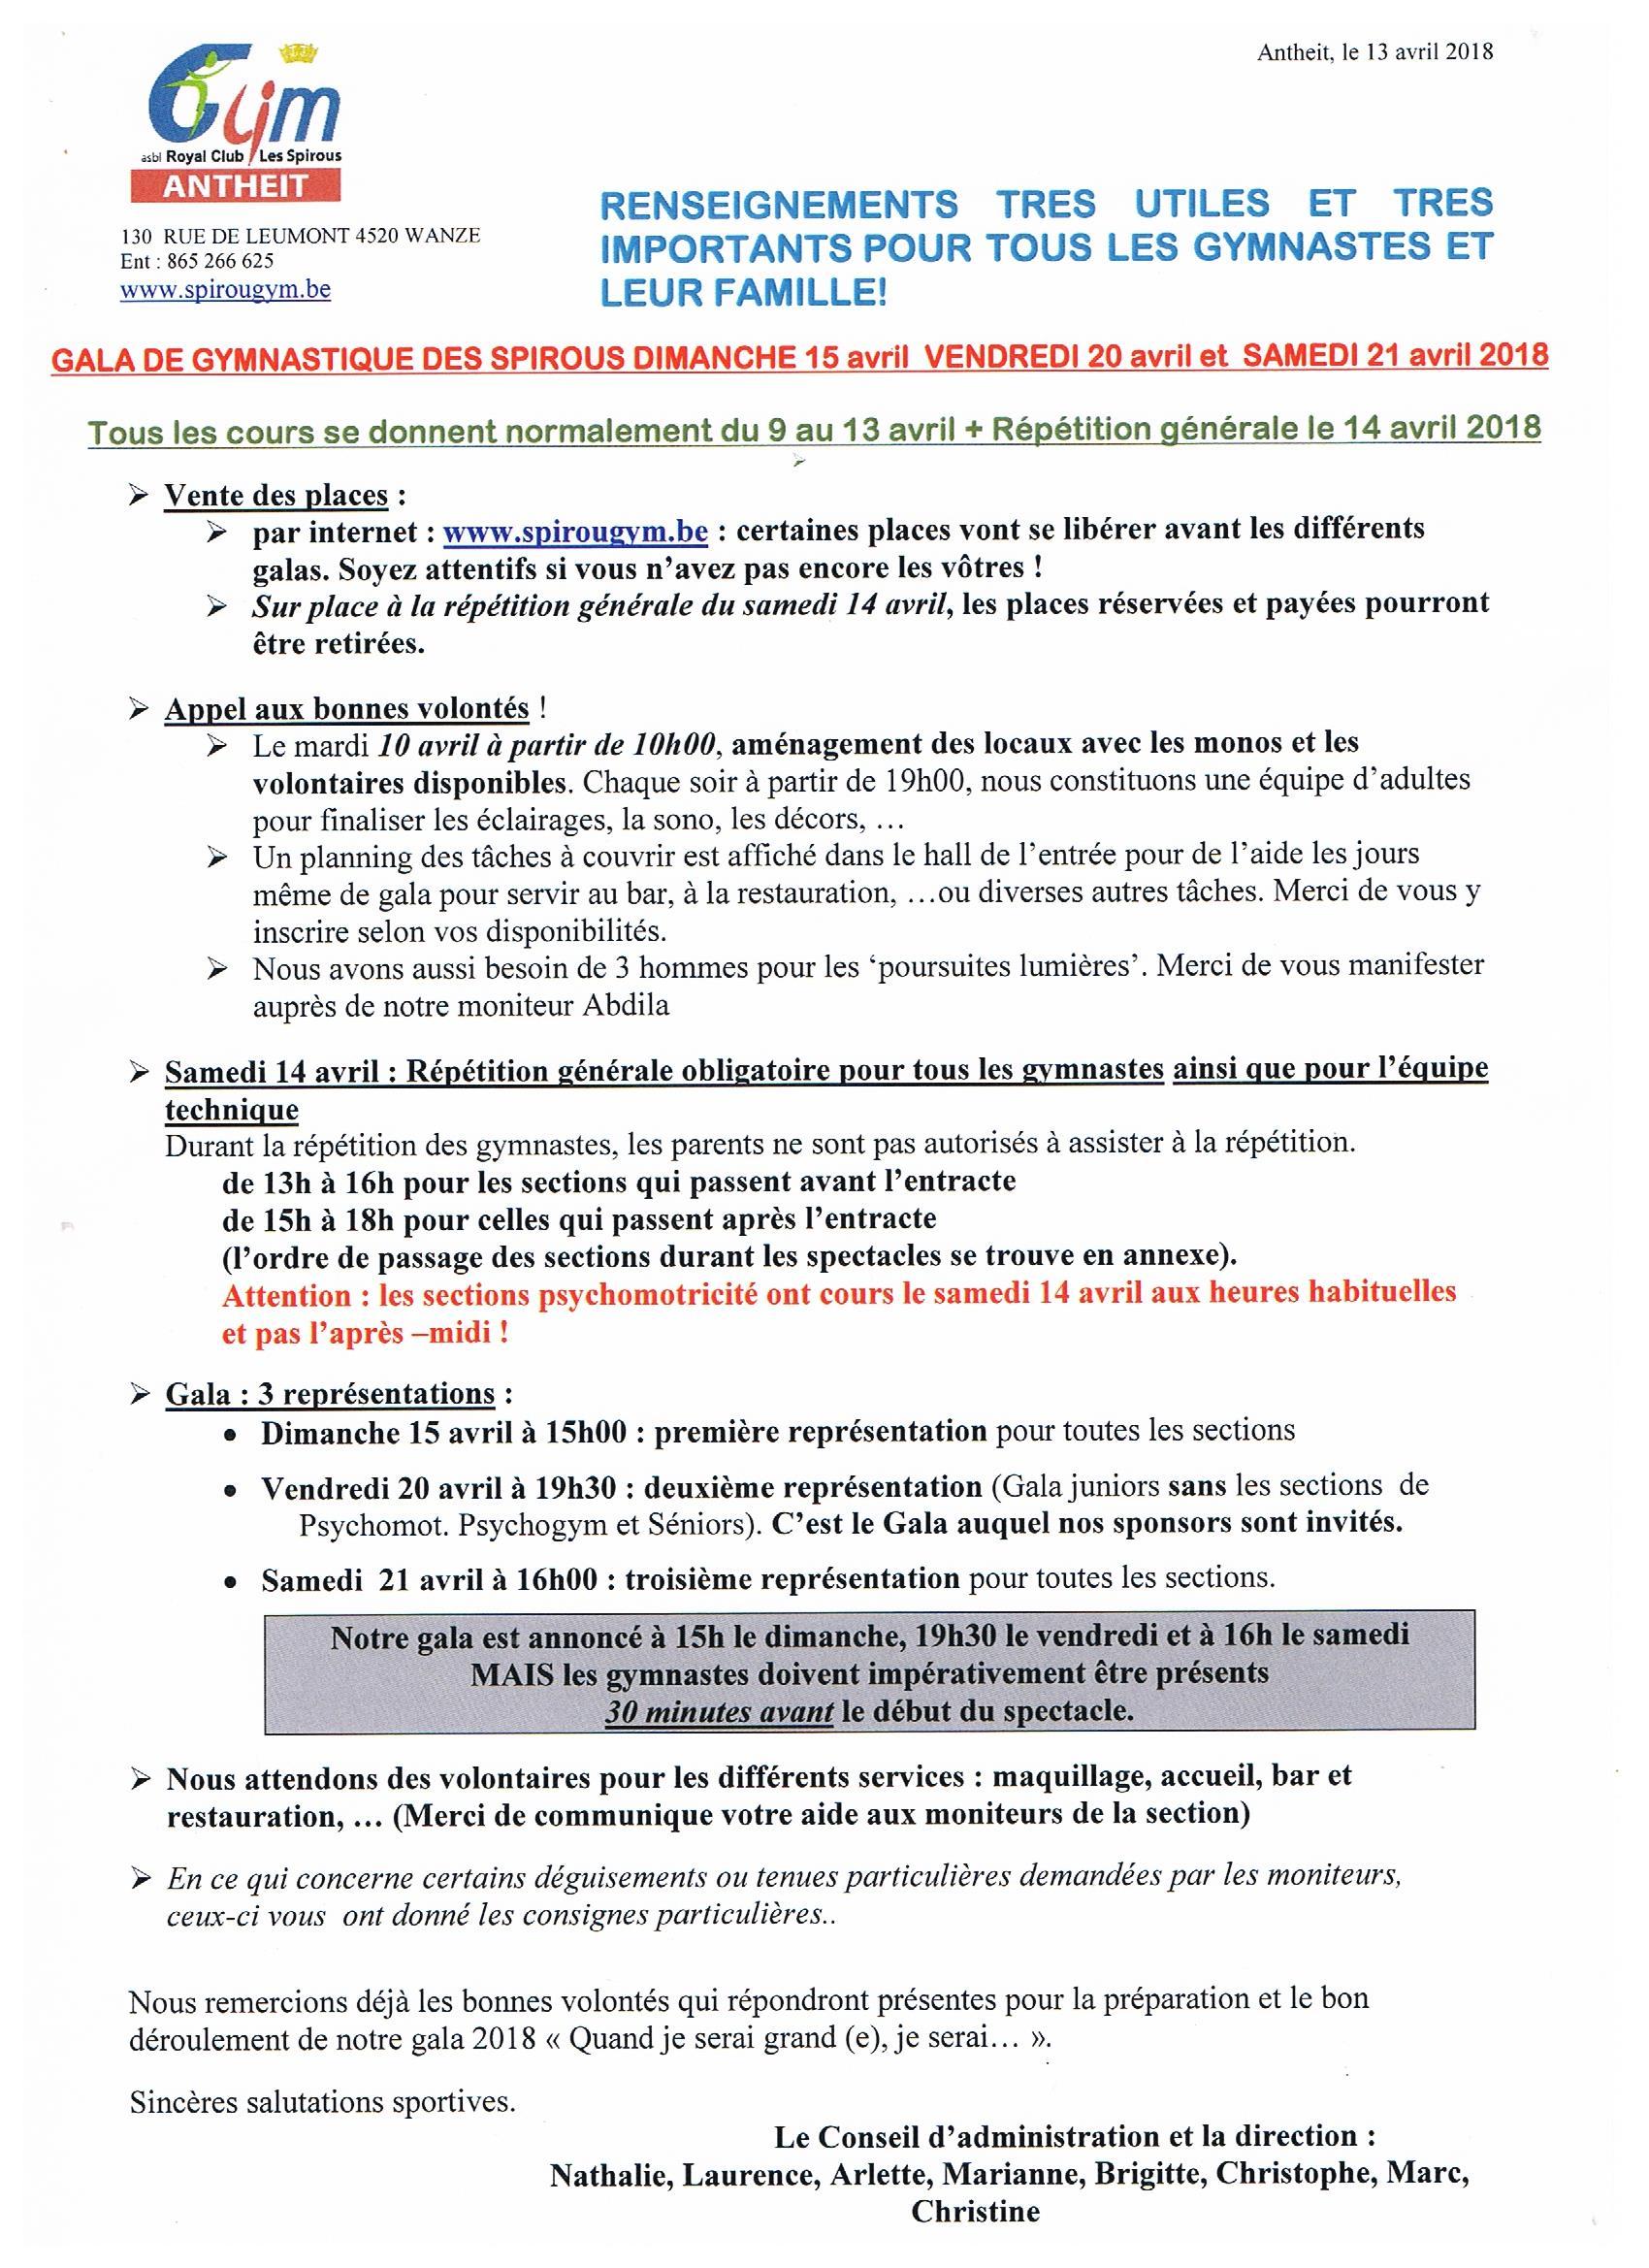 Infos générales GALA 2018